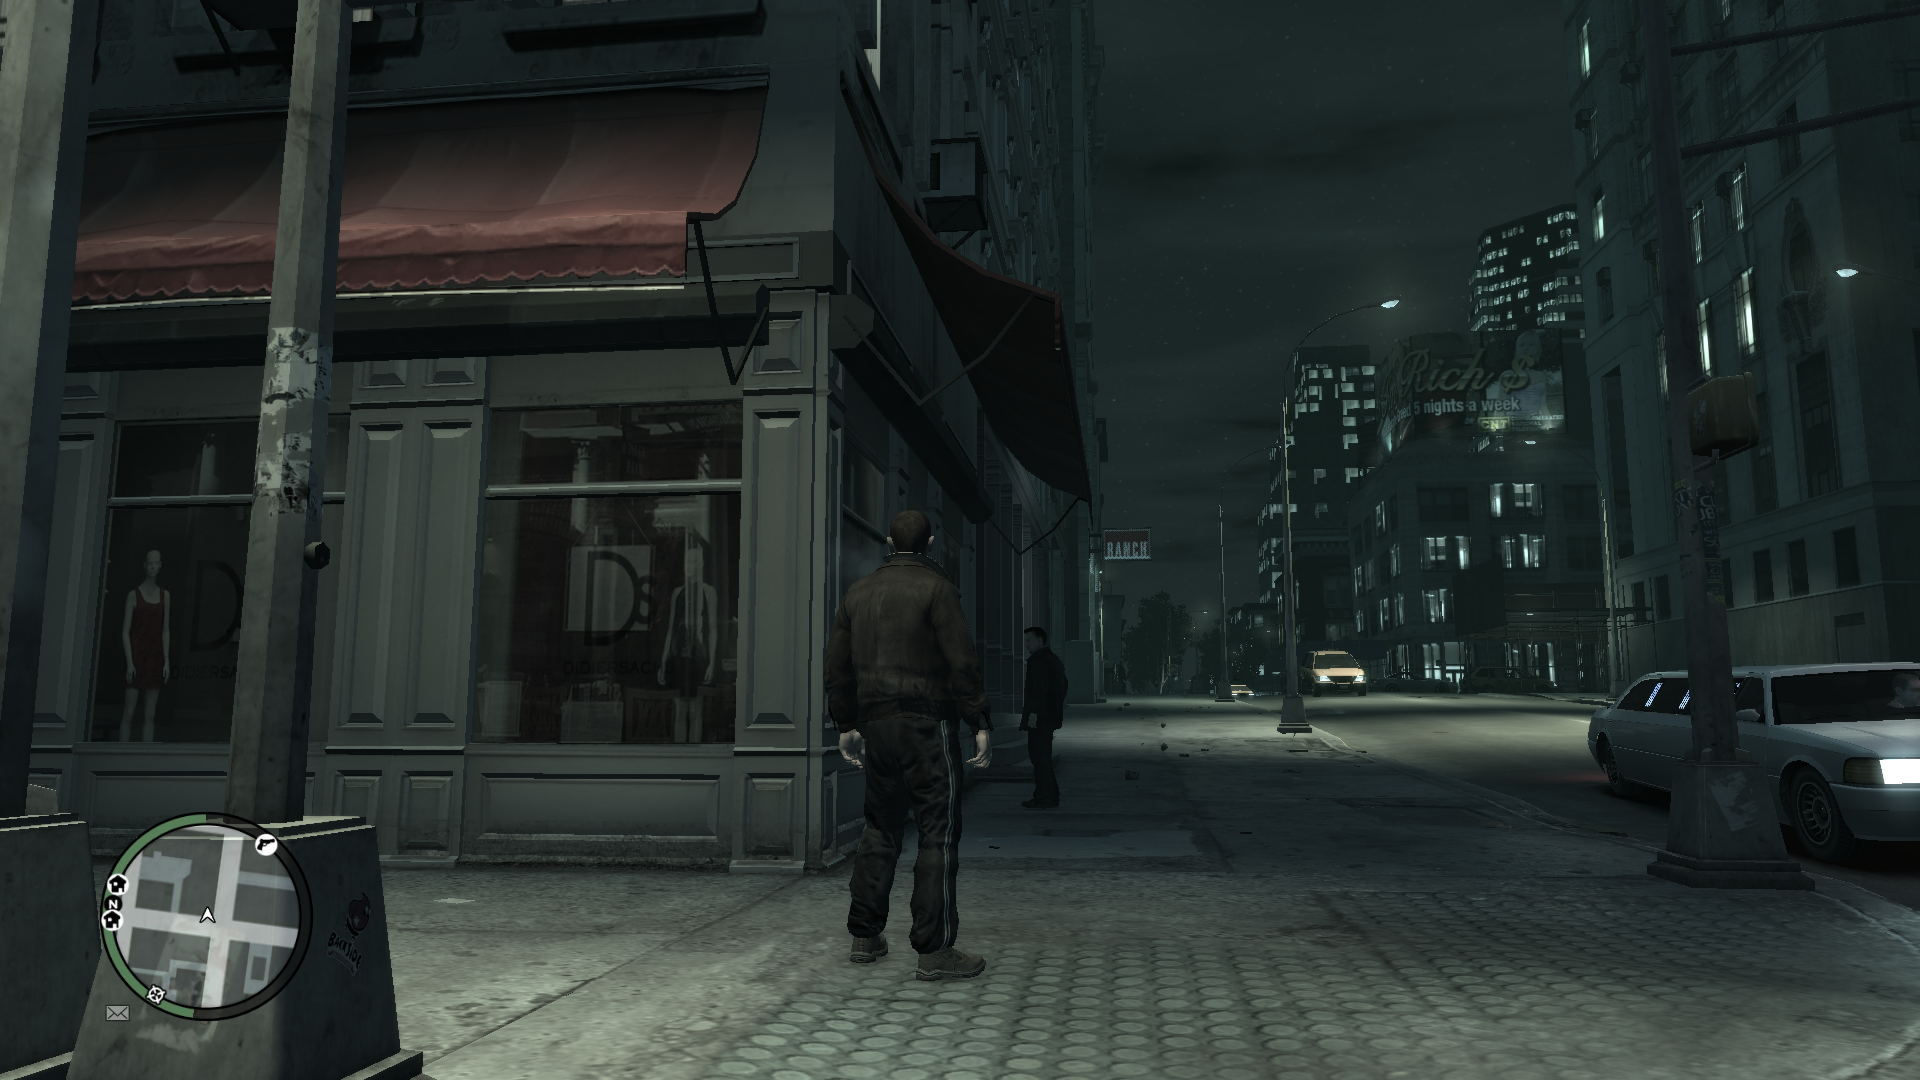 Grand_Theft_Auto_4_Screenshot_2019.08.31